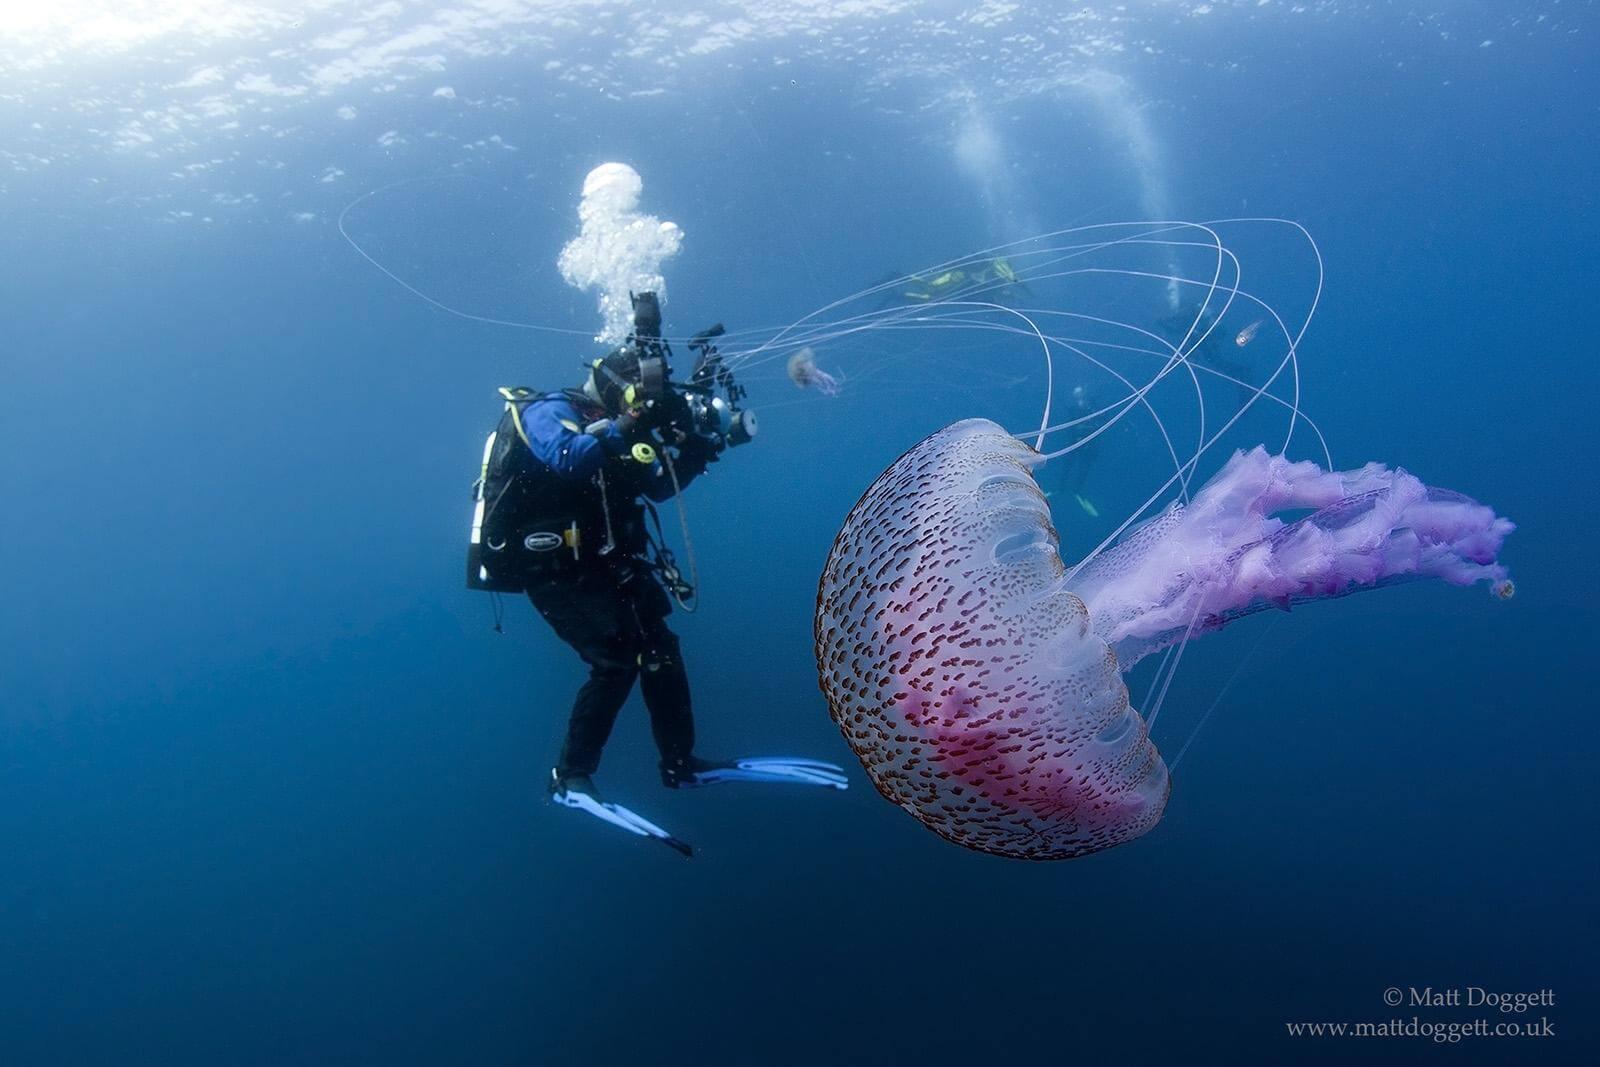 Purple stingers and Scuba diver, North Rona, offshore north west Scotland.